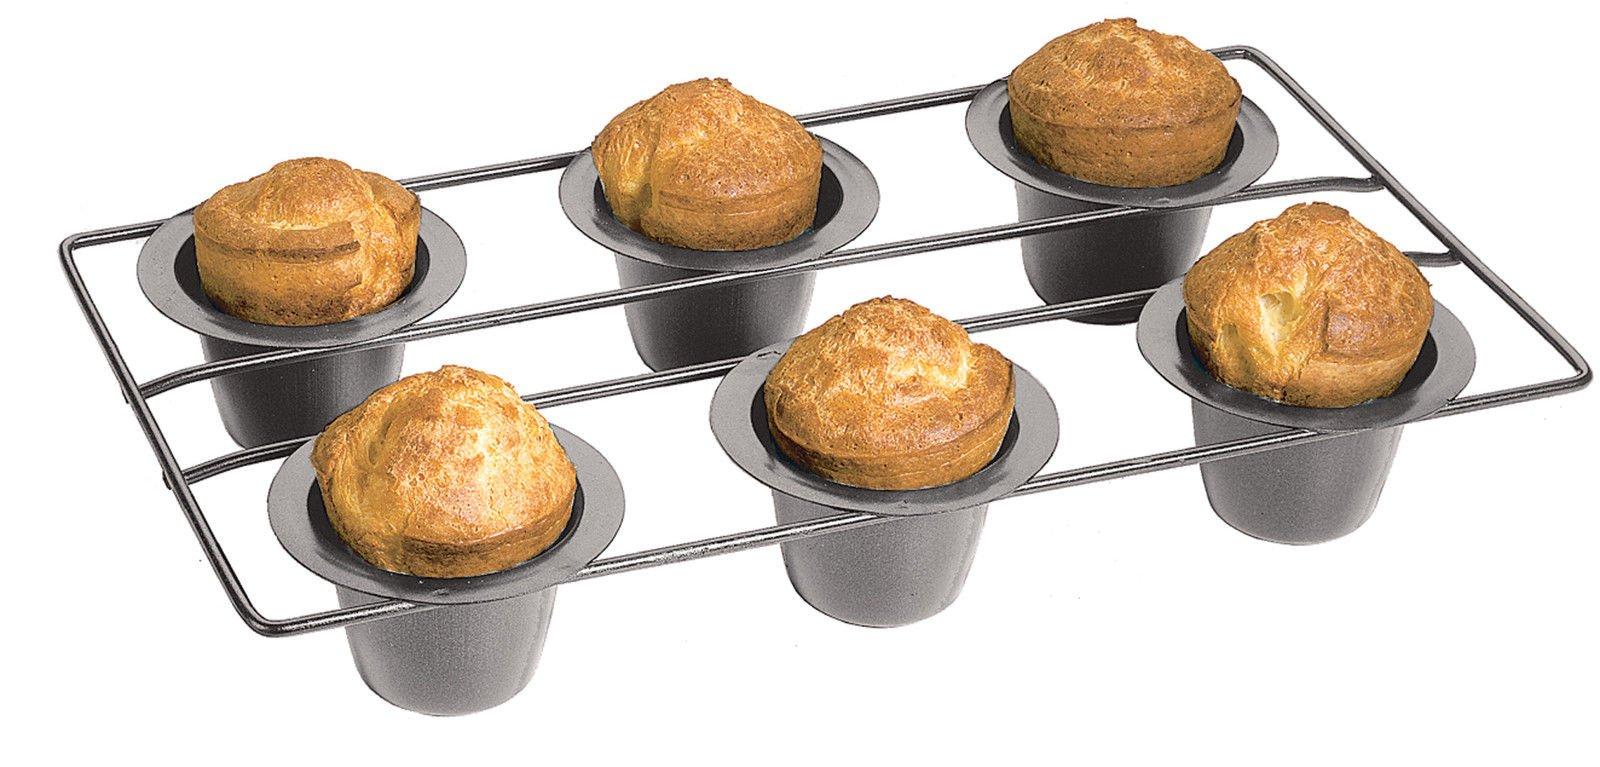 Fox Run Nonstick 6 Cup Linking Popover Muffin Pan Baking Bakeware Breakfast by Fox Run